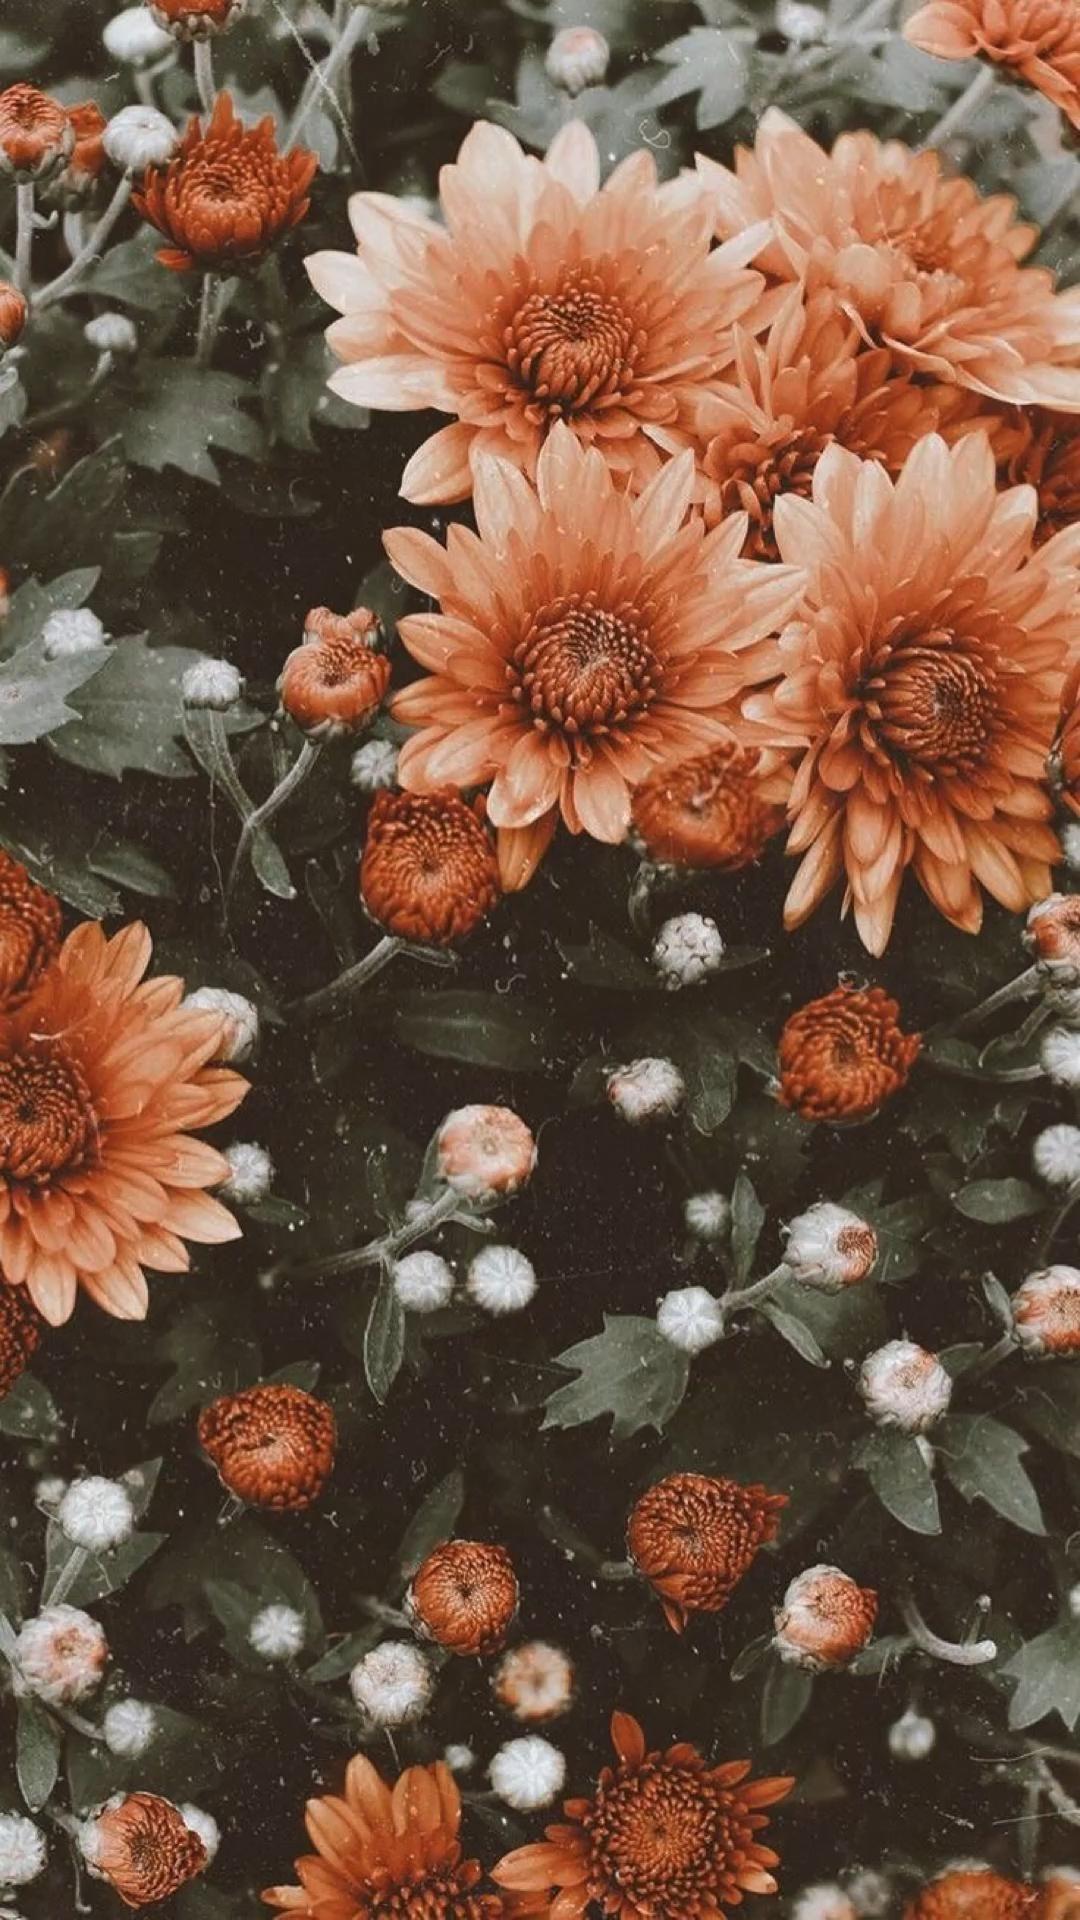 Vintage flower aesthetic 🌸🌷🌺🌼🌻🌹